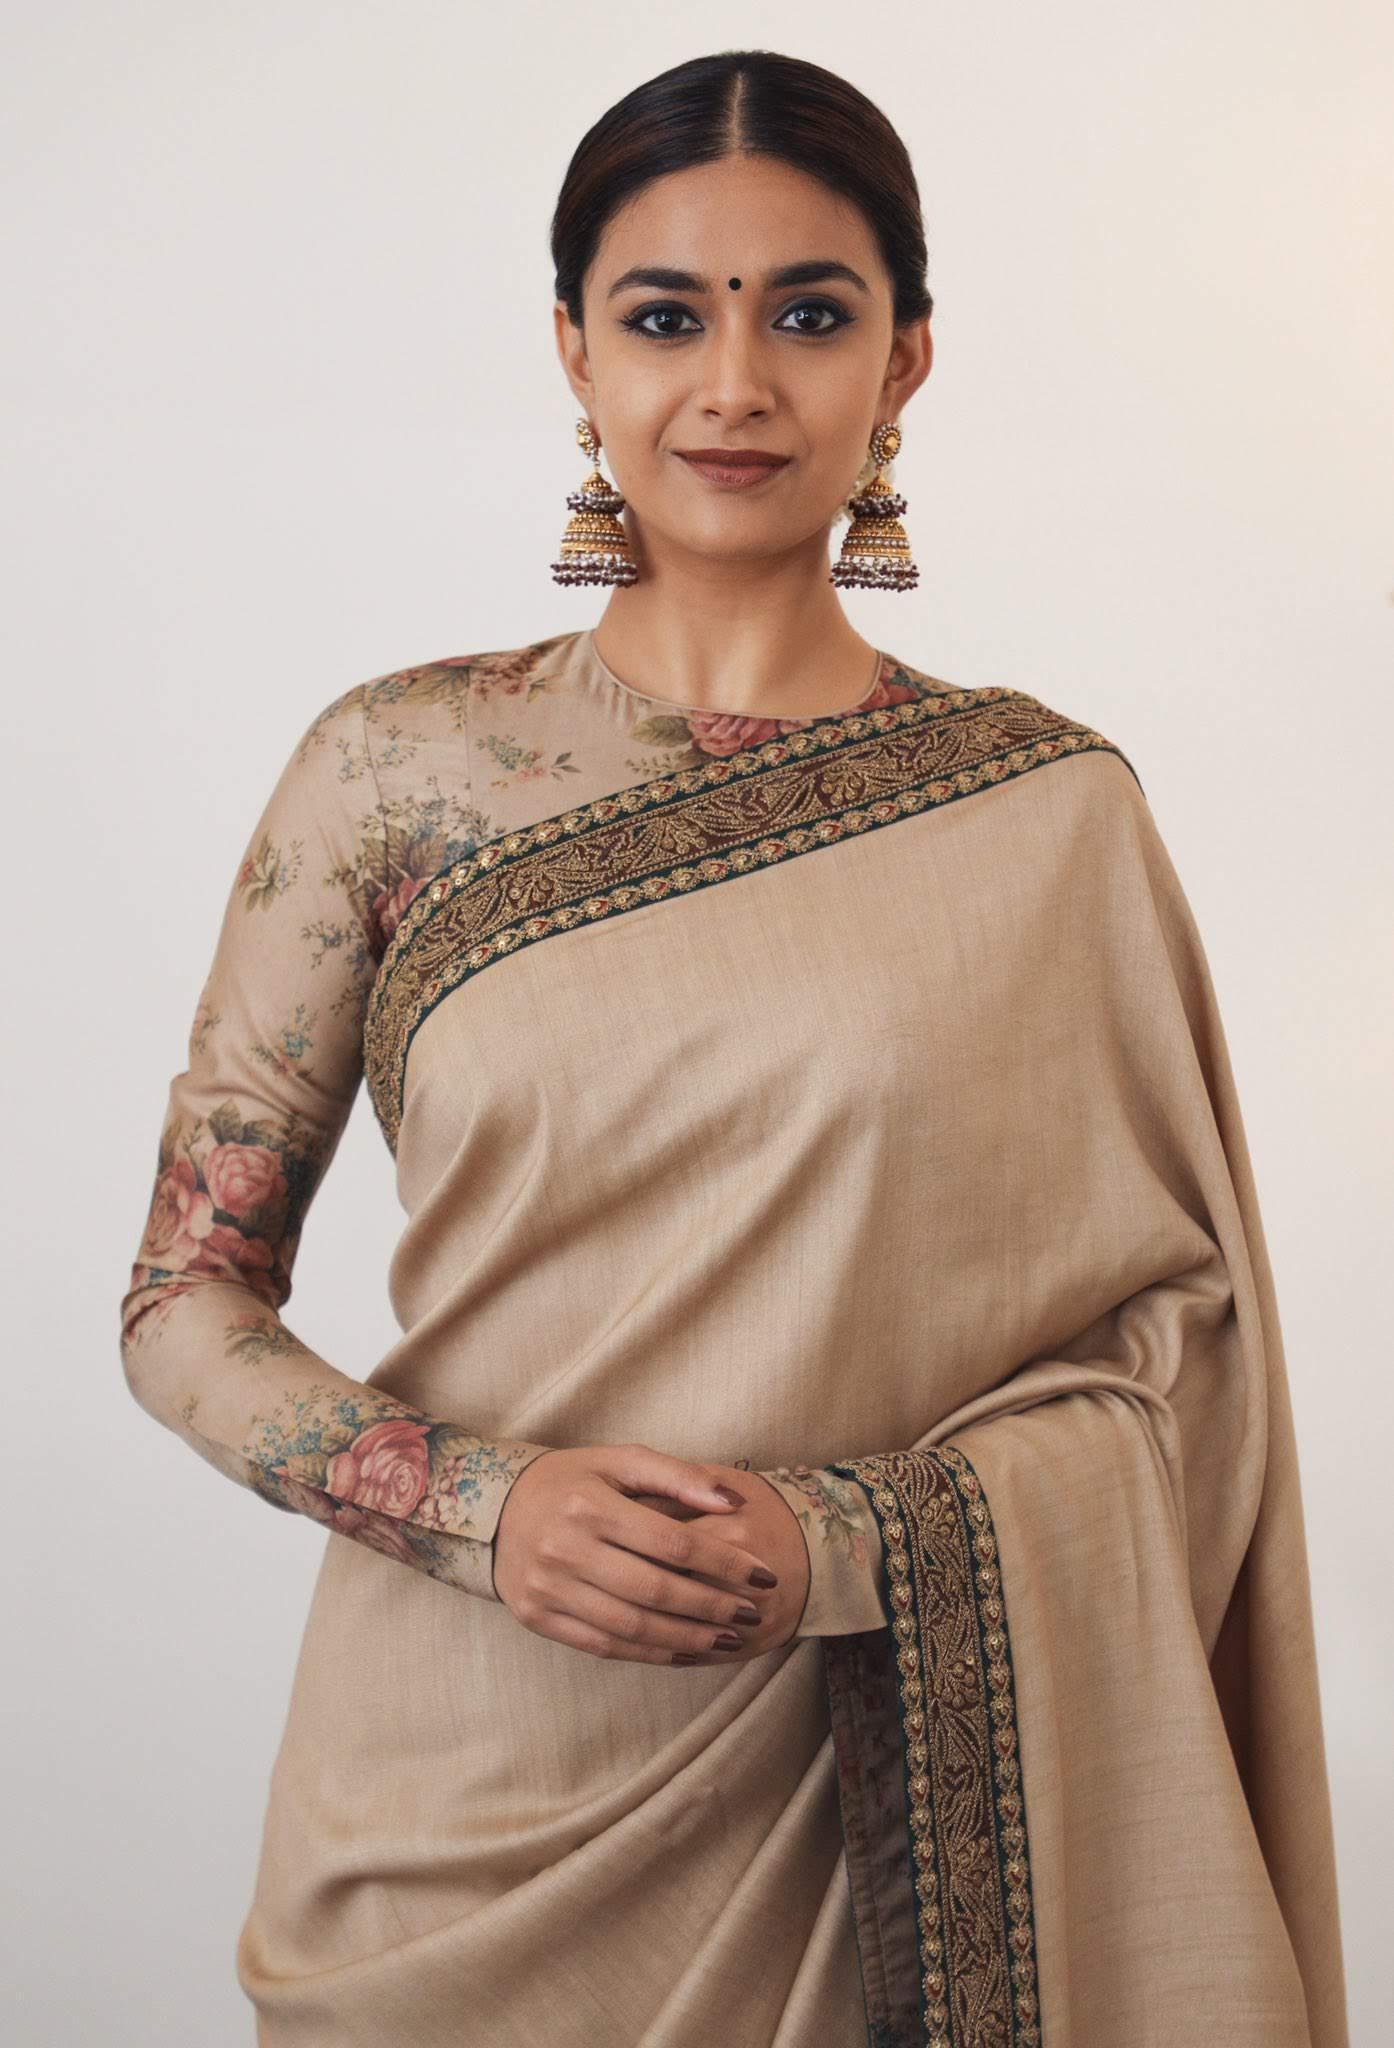 Keerthi-Suresh-Images-HD-21